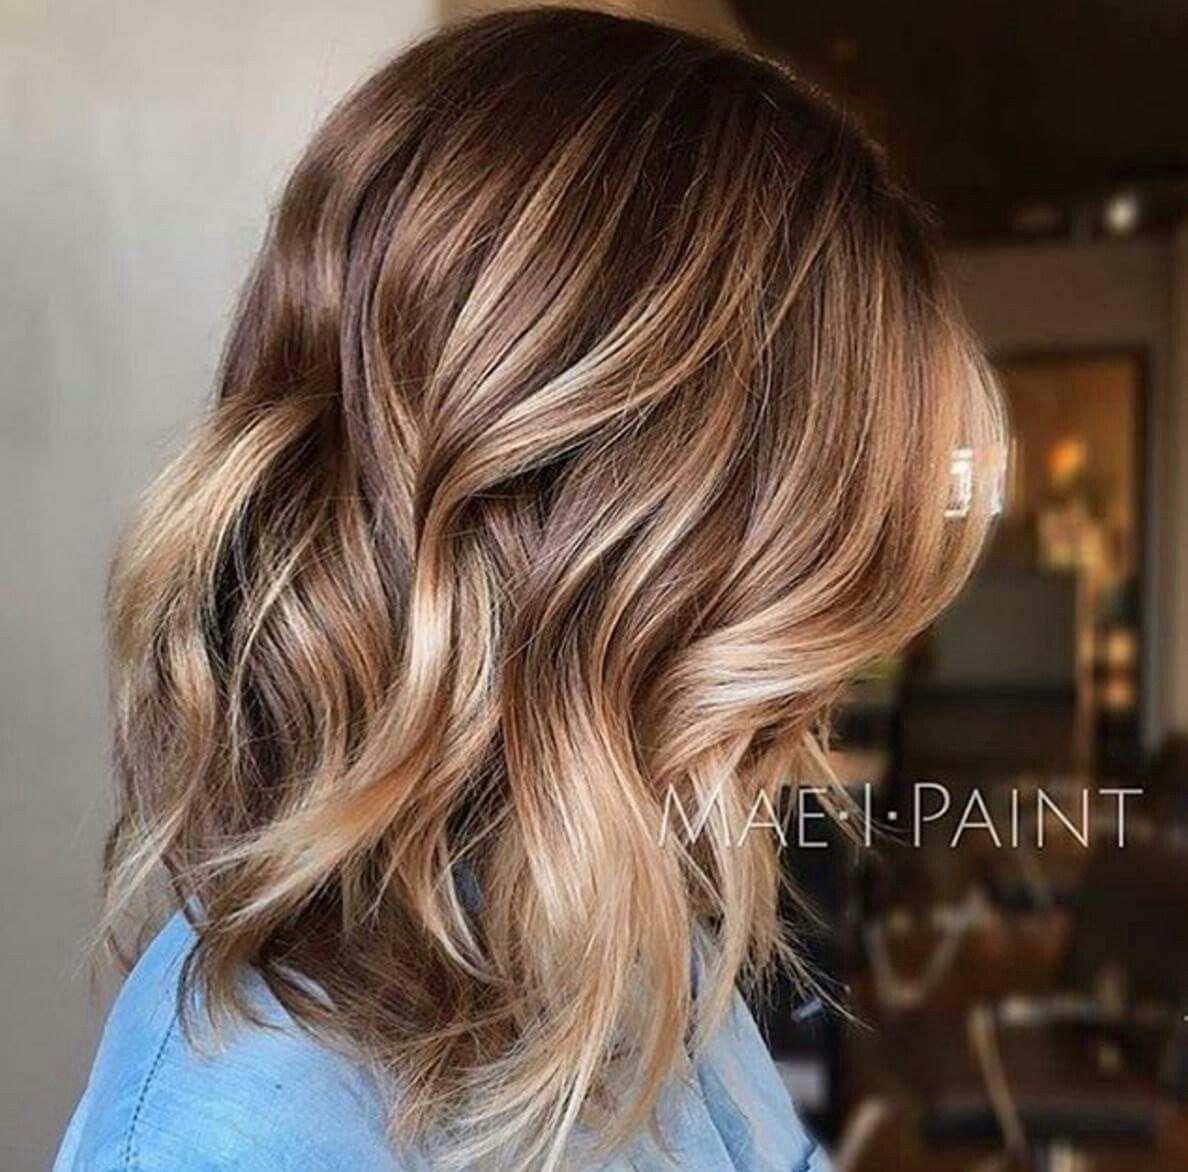 Pin by amanda potter on highlights pinterest hair style hair